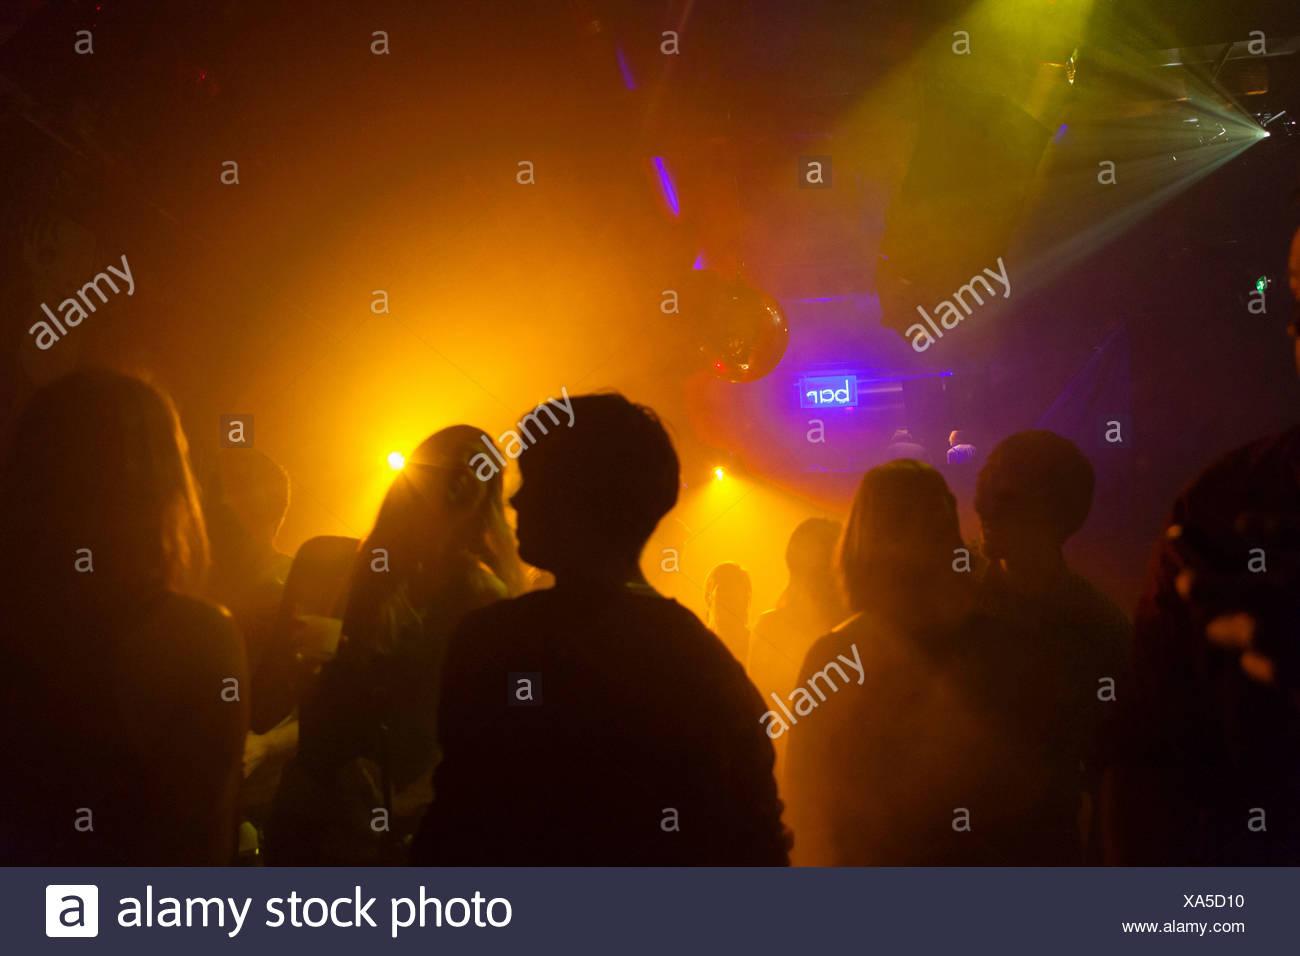 Nightclub scene with people dancing, disco ball, lighting equipment - Stock Image